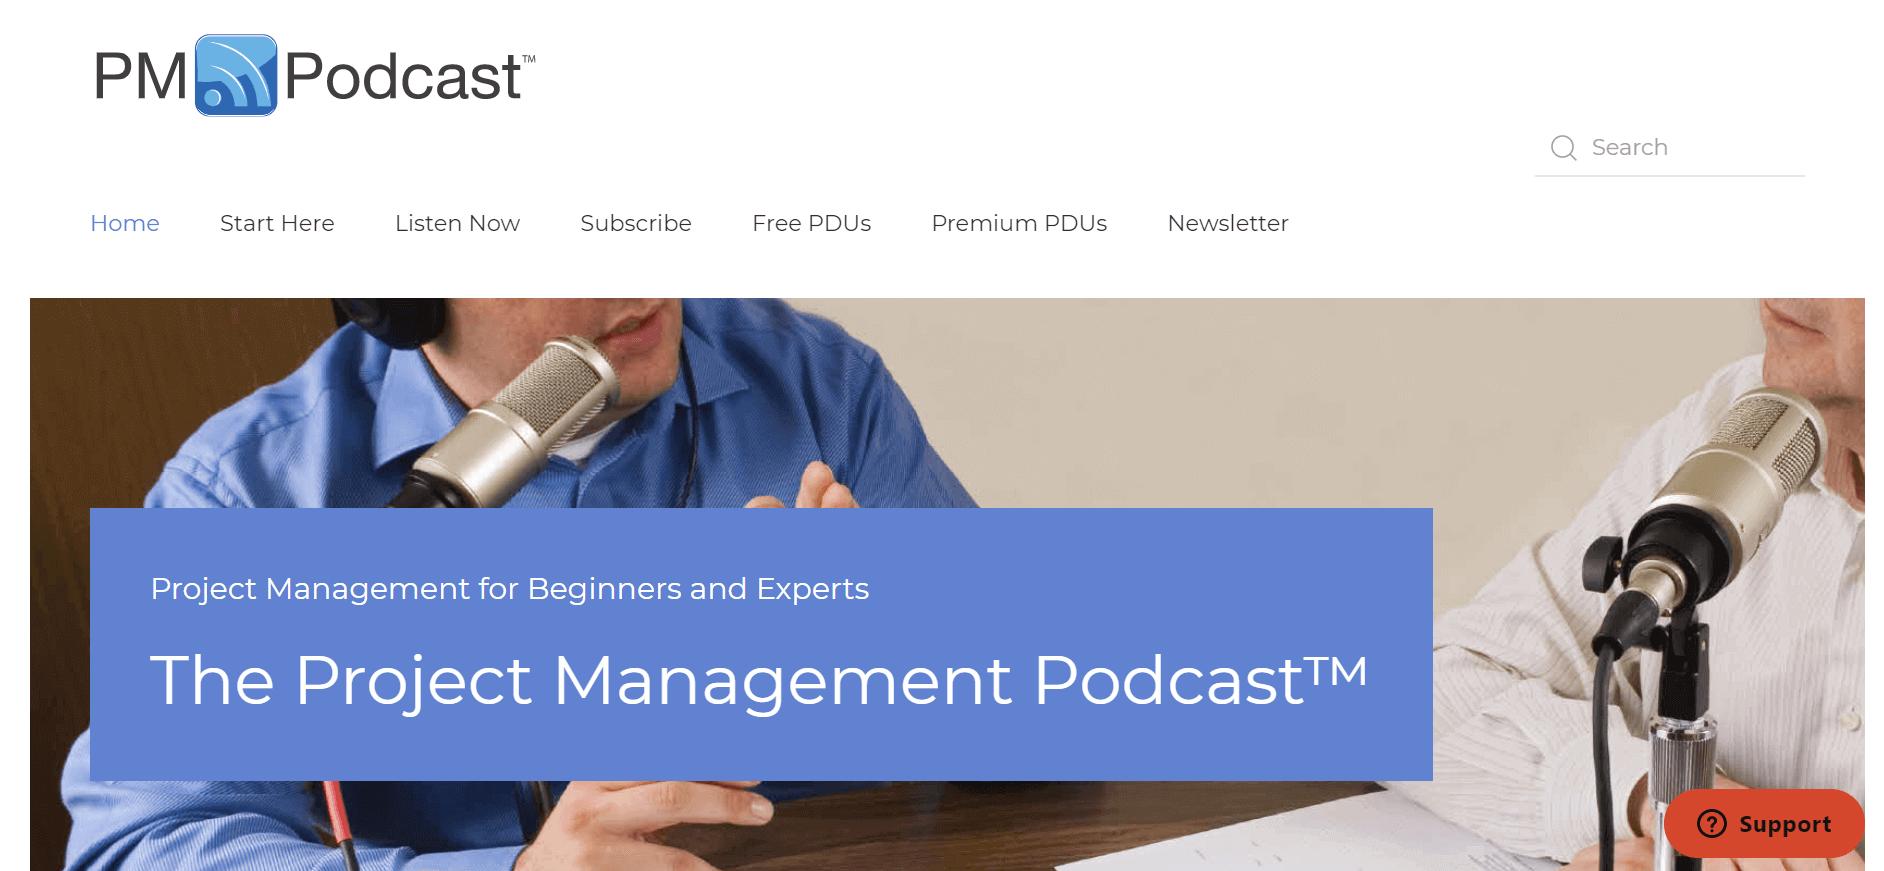 Projektmanagement-Podcasts PM Podcast